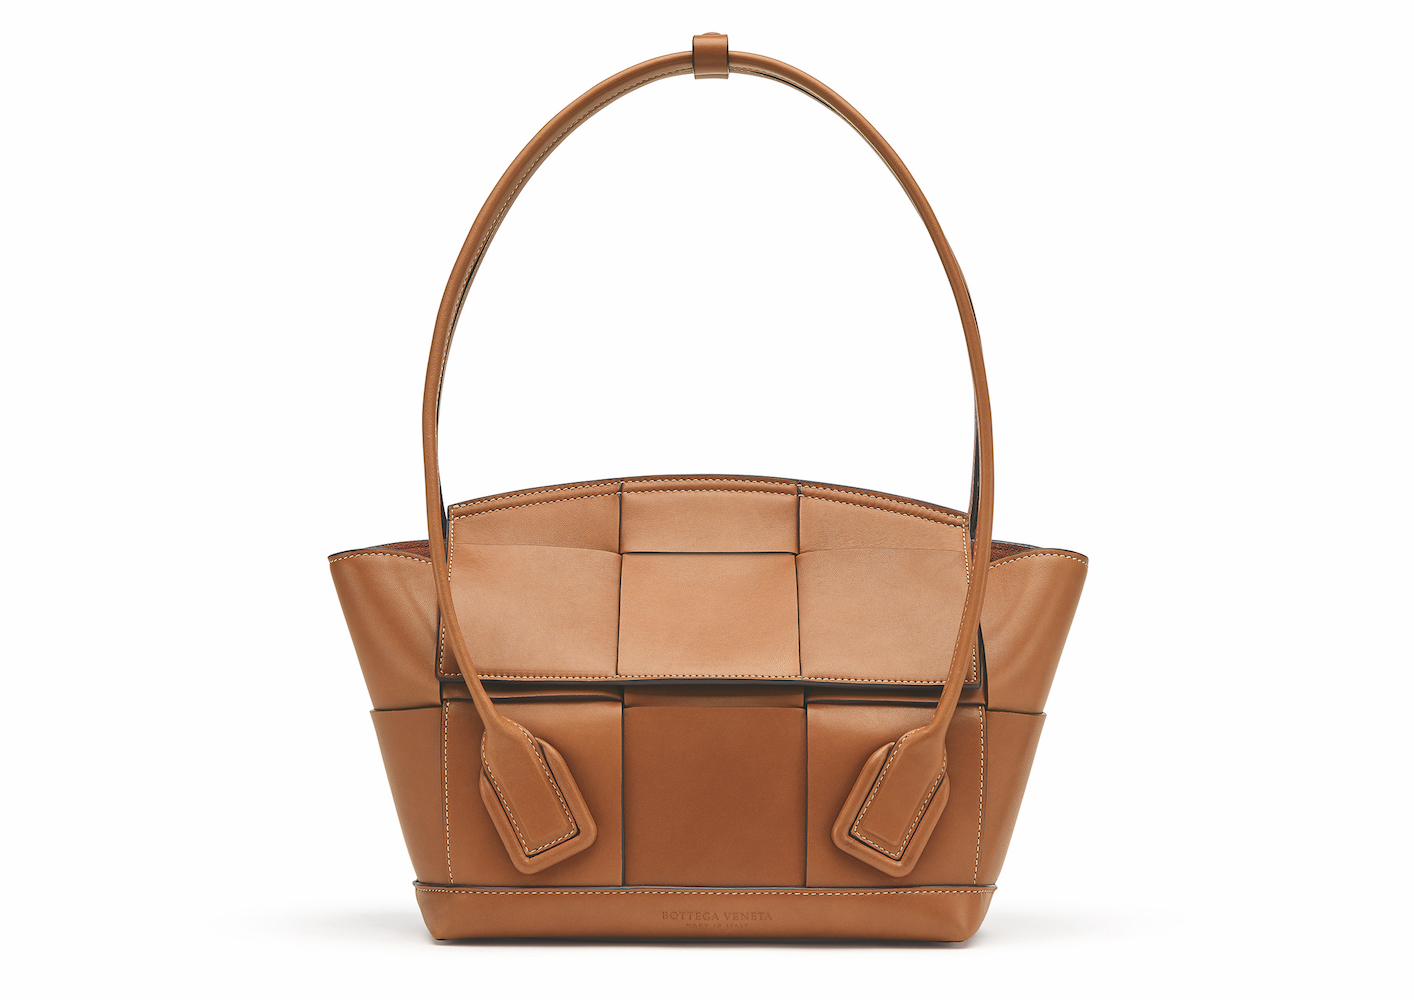 Bottega Veneta The Arco Bag (4).jpg